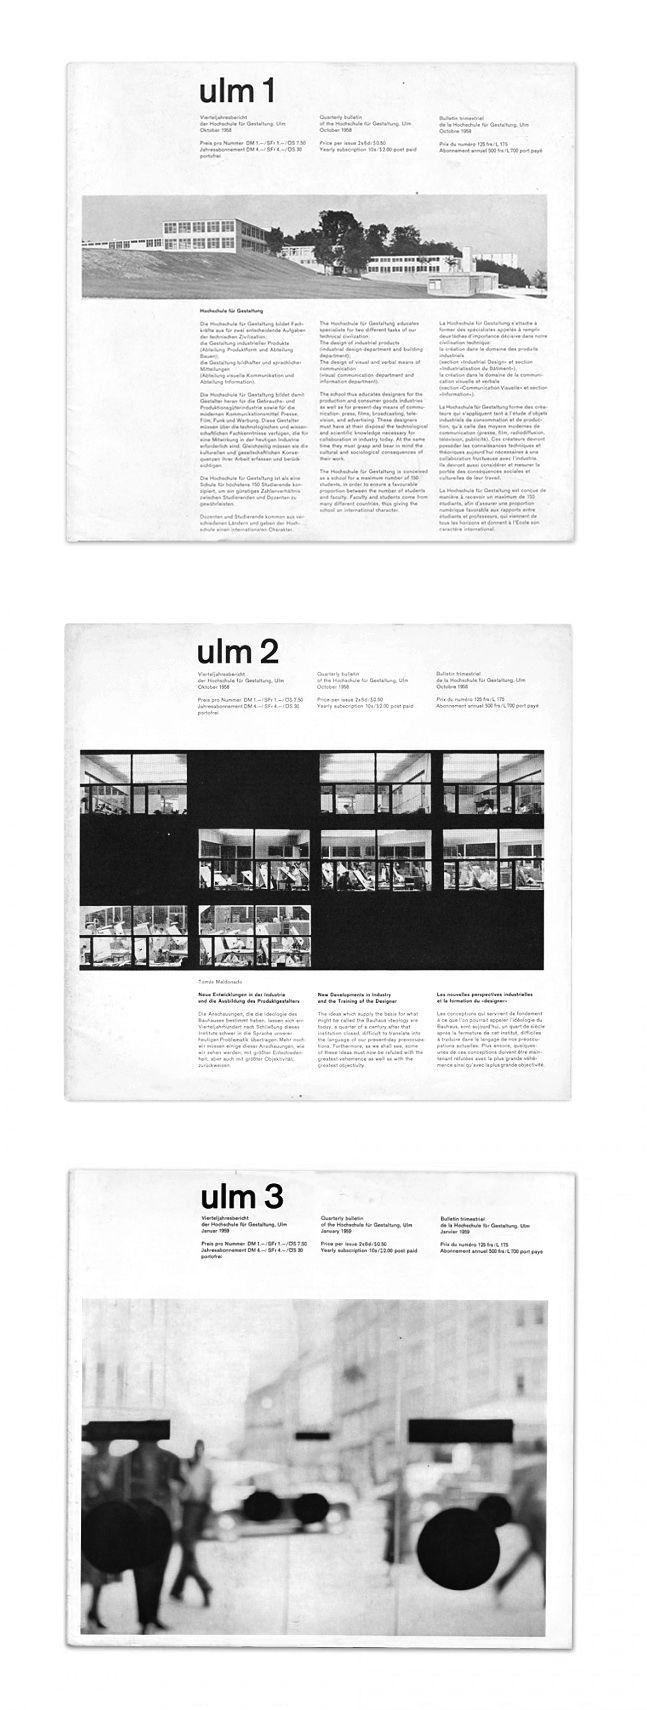 BOLETÍN HfG. Ulm, 1958. Designer, Anthony Froshaug (1920-1984). Editor, Dr. Hanno Kesting (1925-1975).